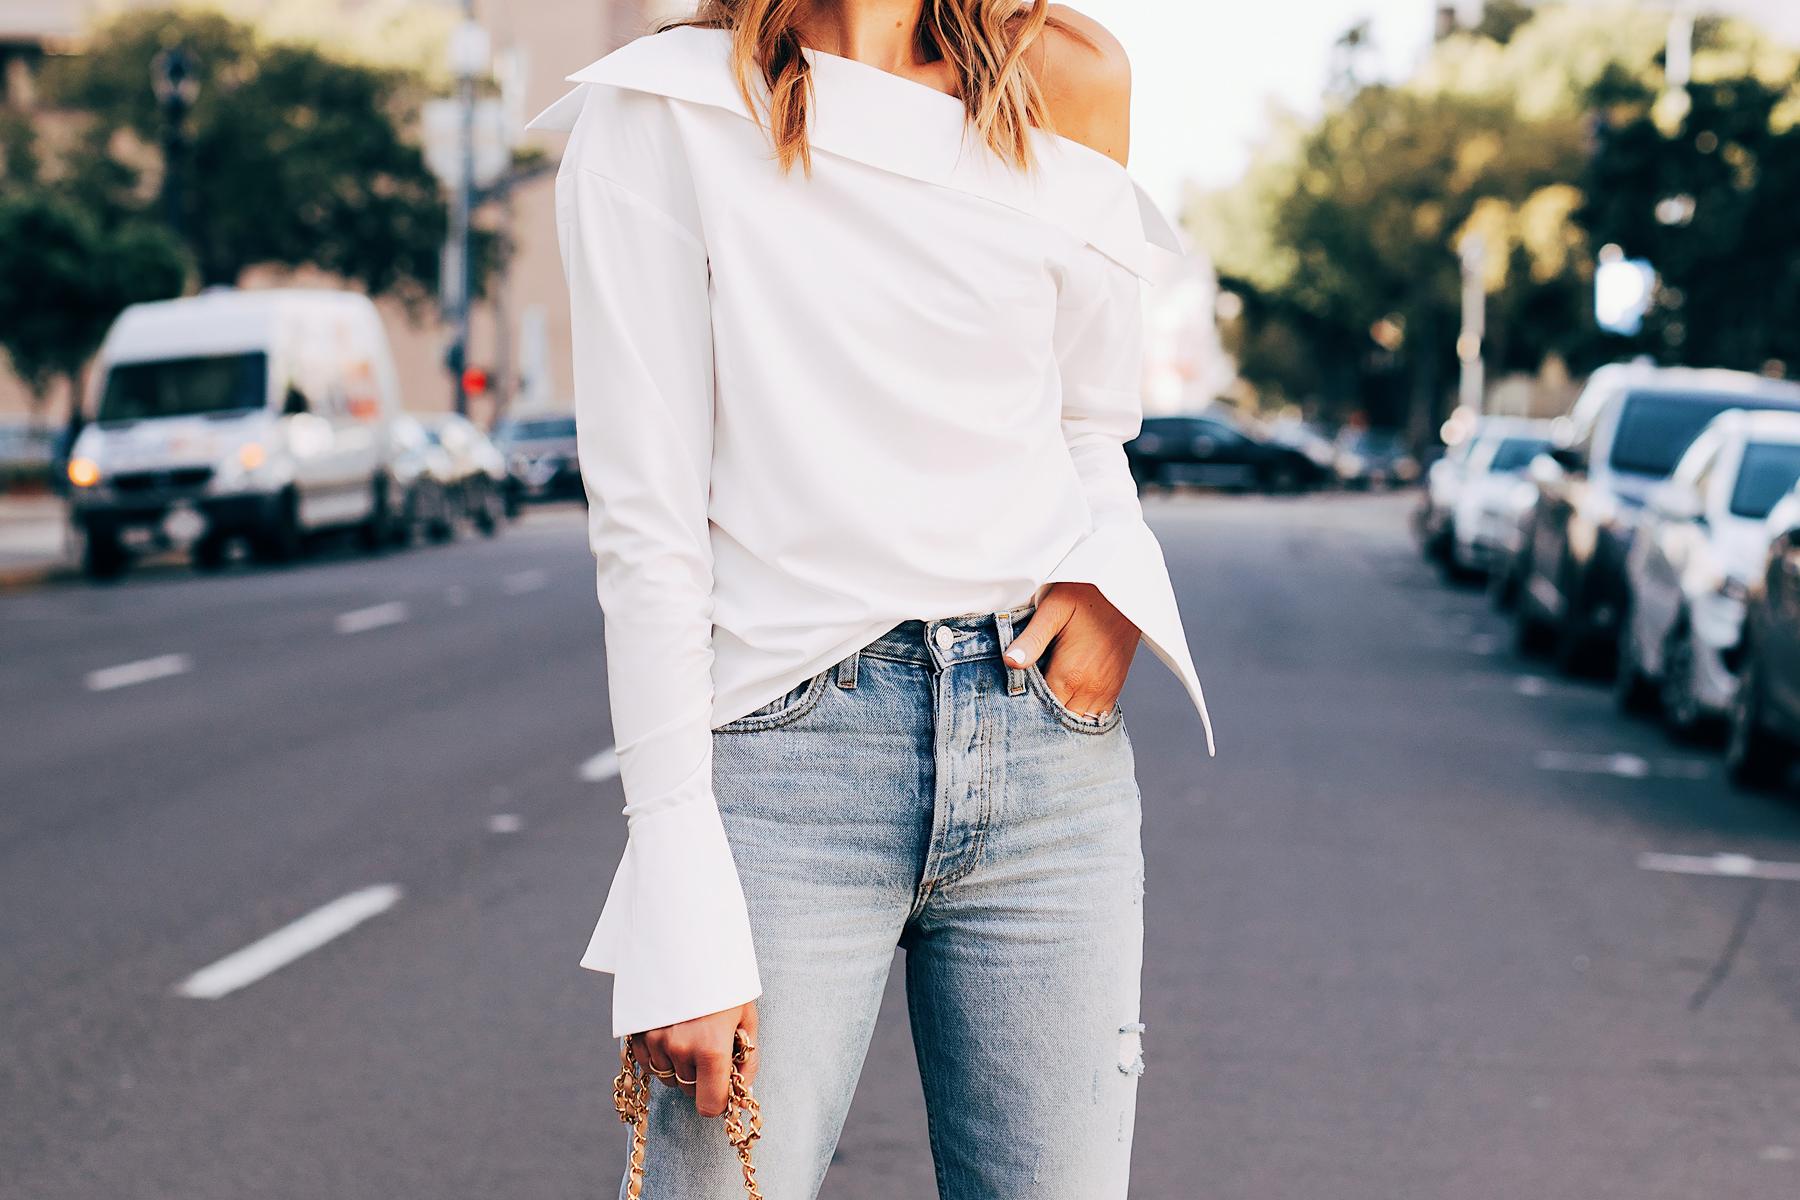 Blonde Woman Wearing Jing Dakota White Off the Shoulder Top Fashion Jackson San Diego Fashion Blogger Street Style